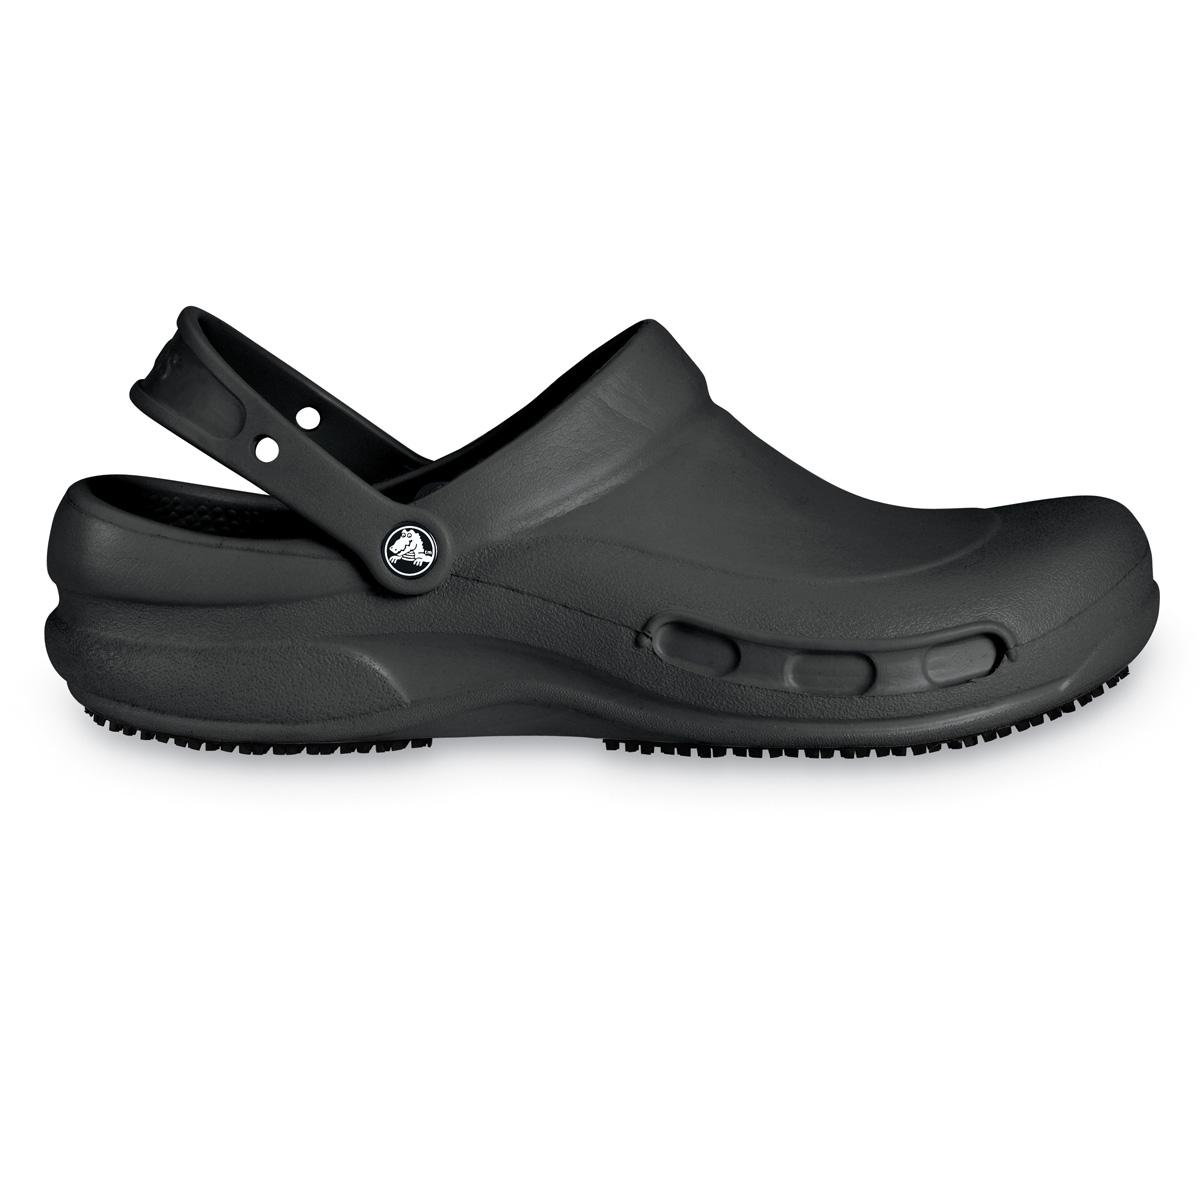 Crocs Bistro - Siyah